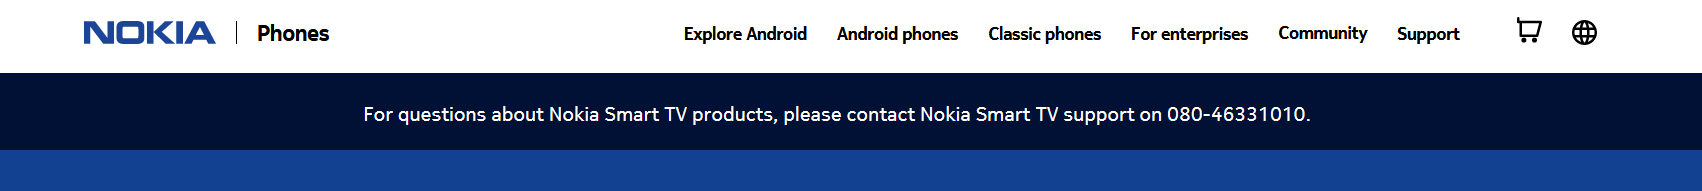 Screenshot_2020-03-14 Nokia customer care and support Nokia phones.png